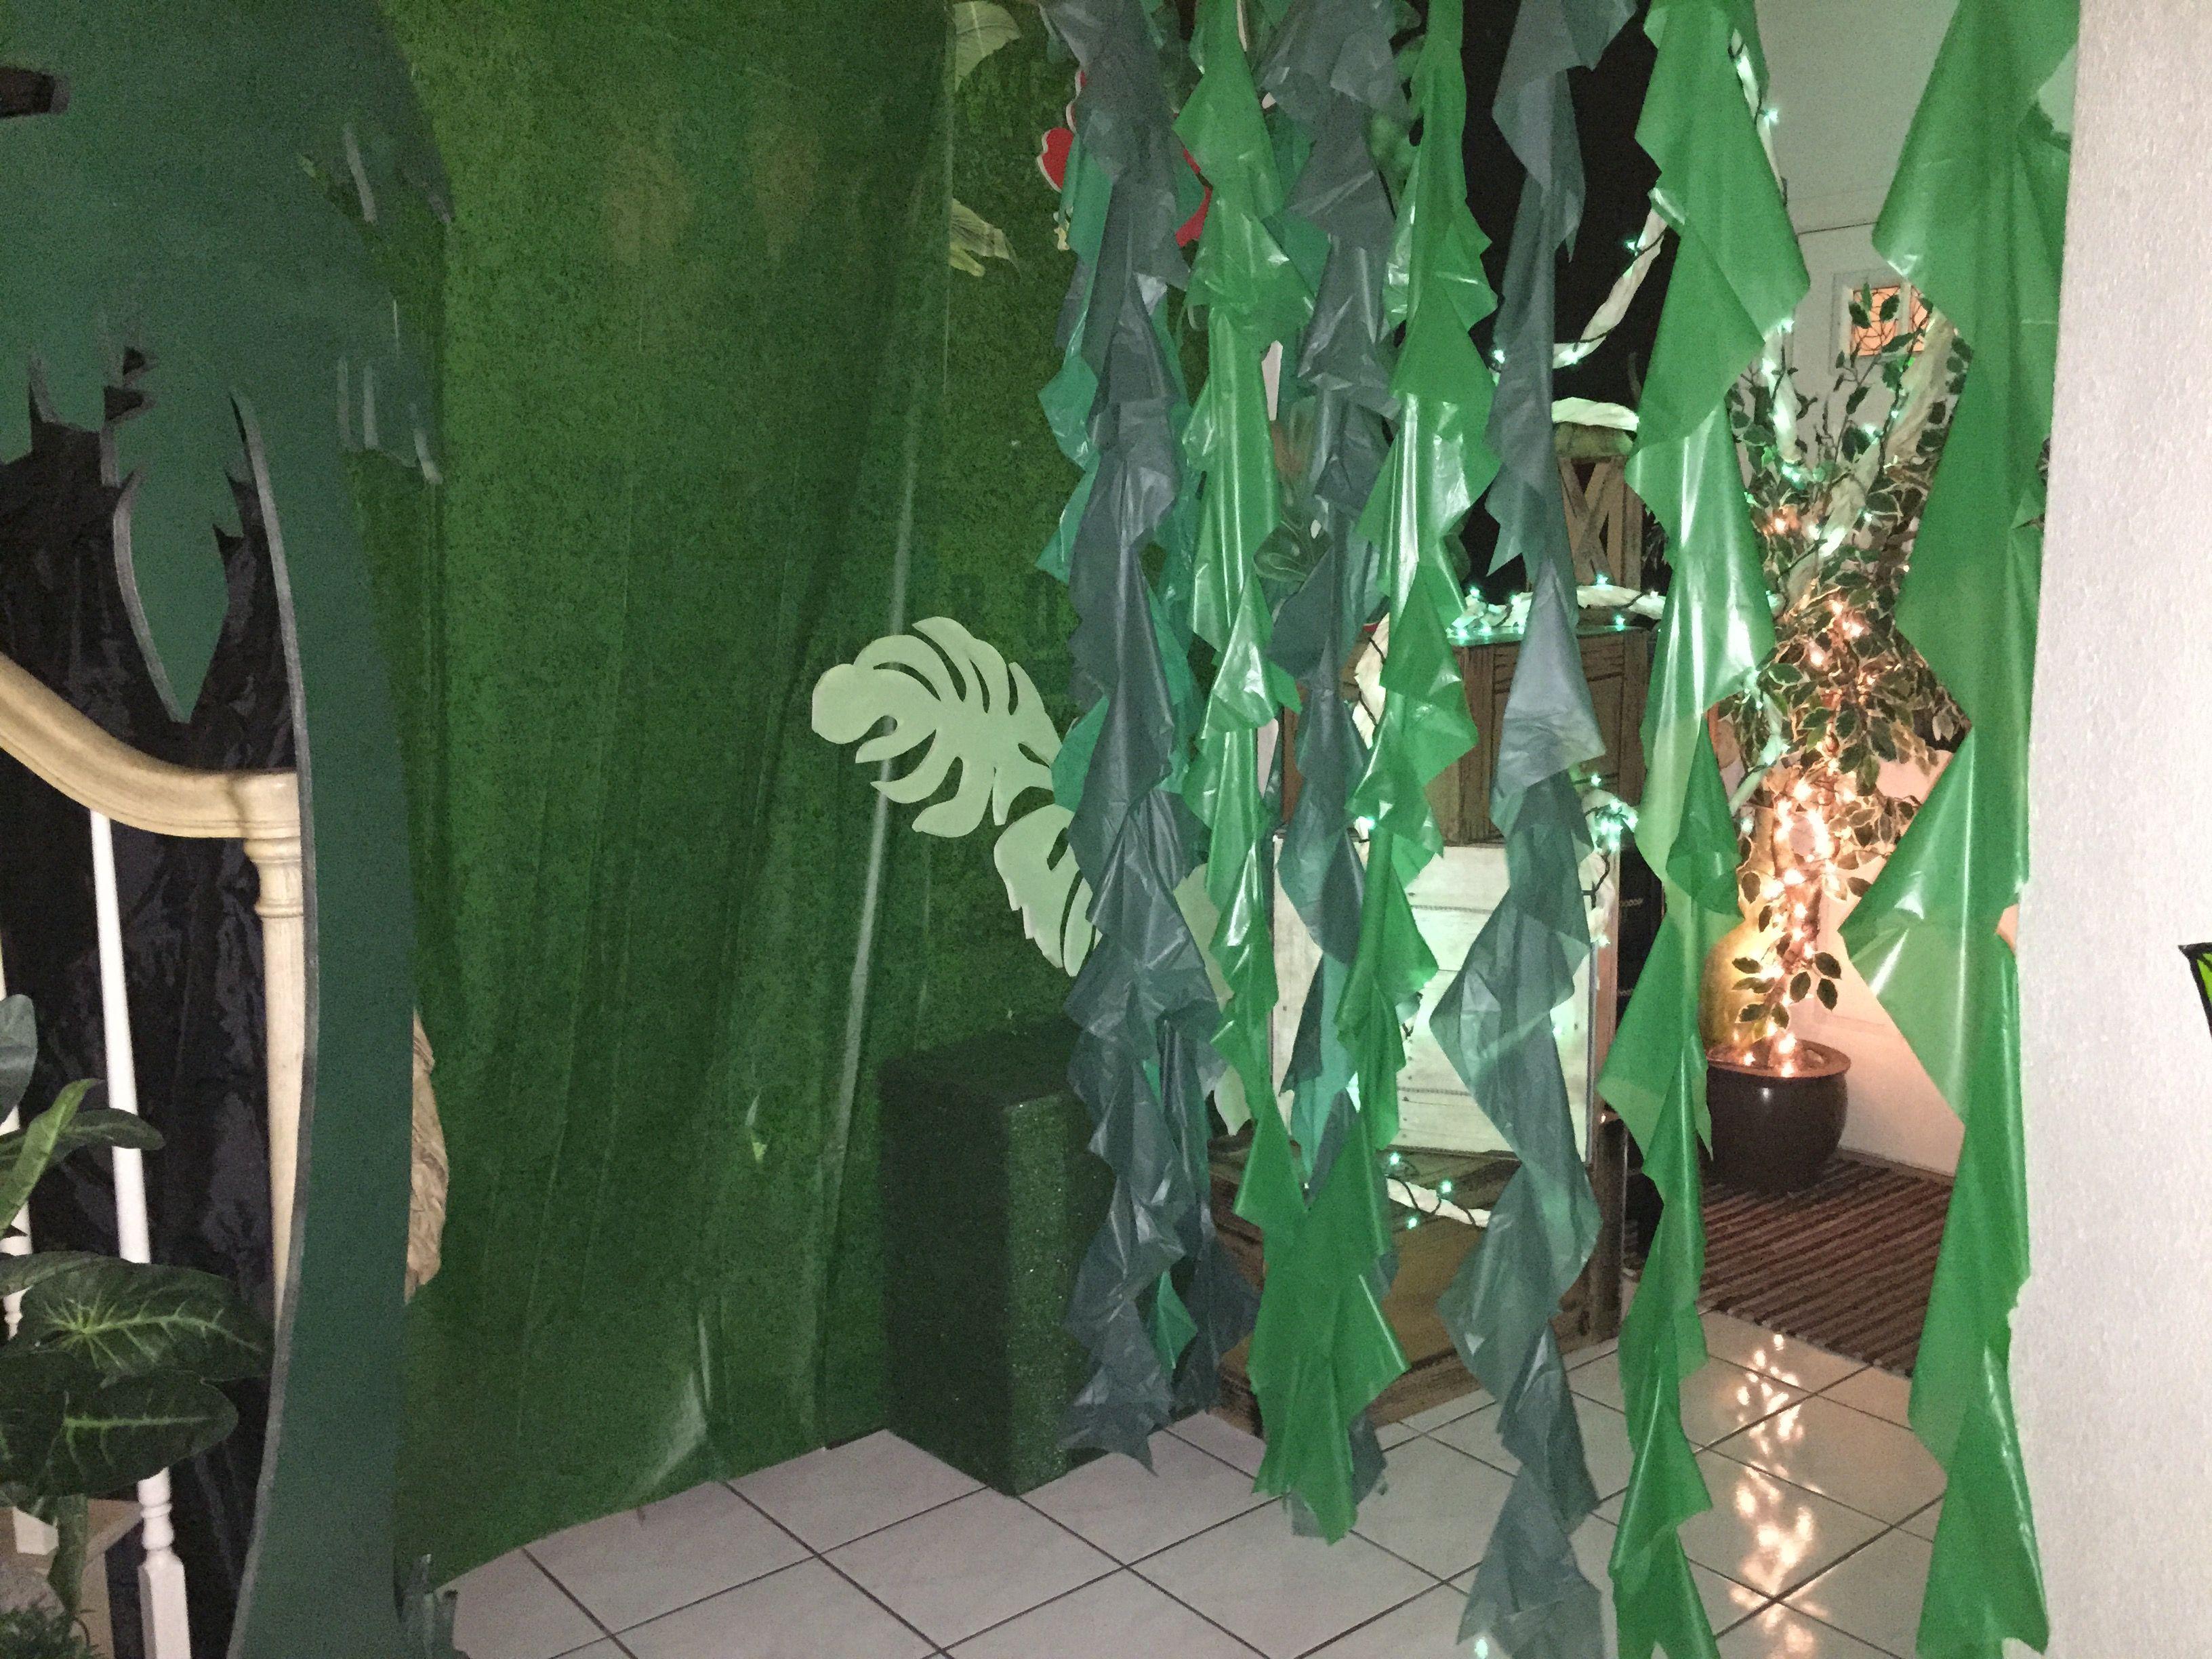 Magalie Sarnataro's props Jungle decor details